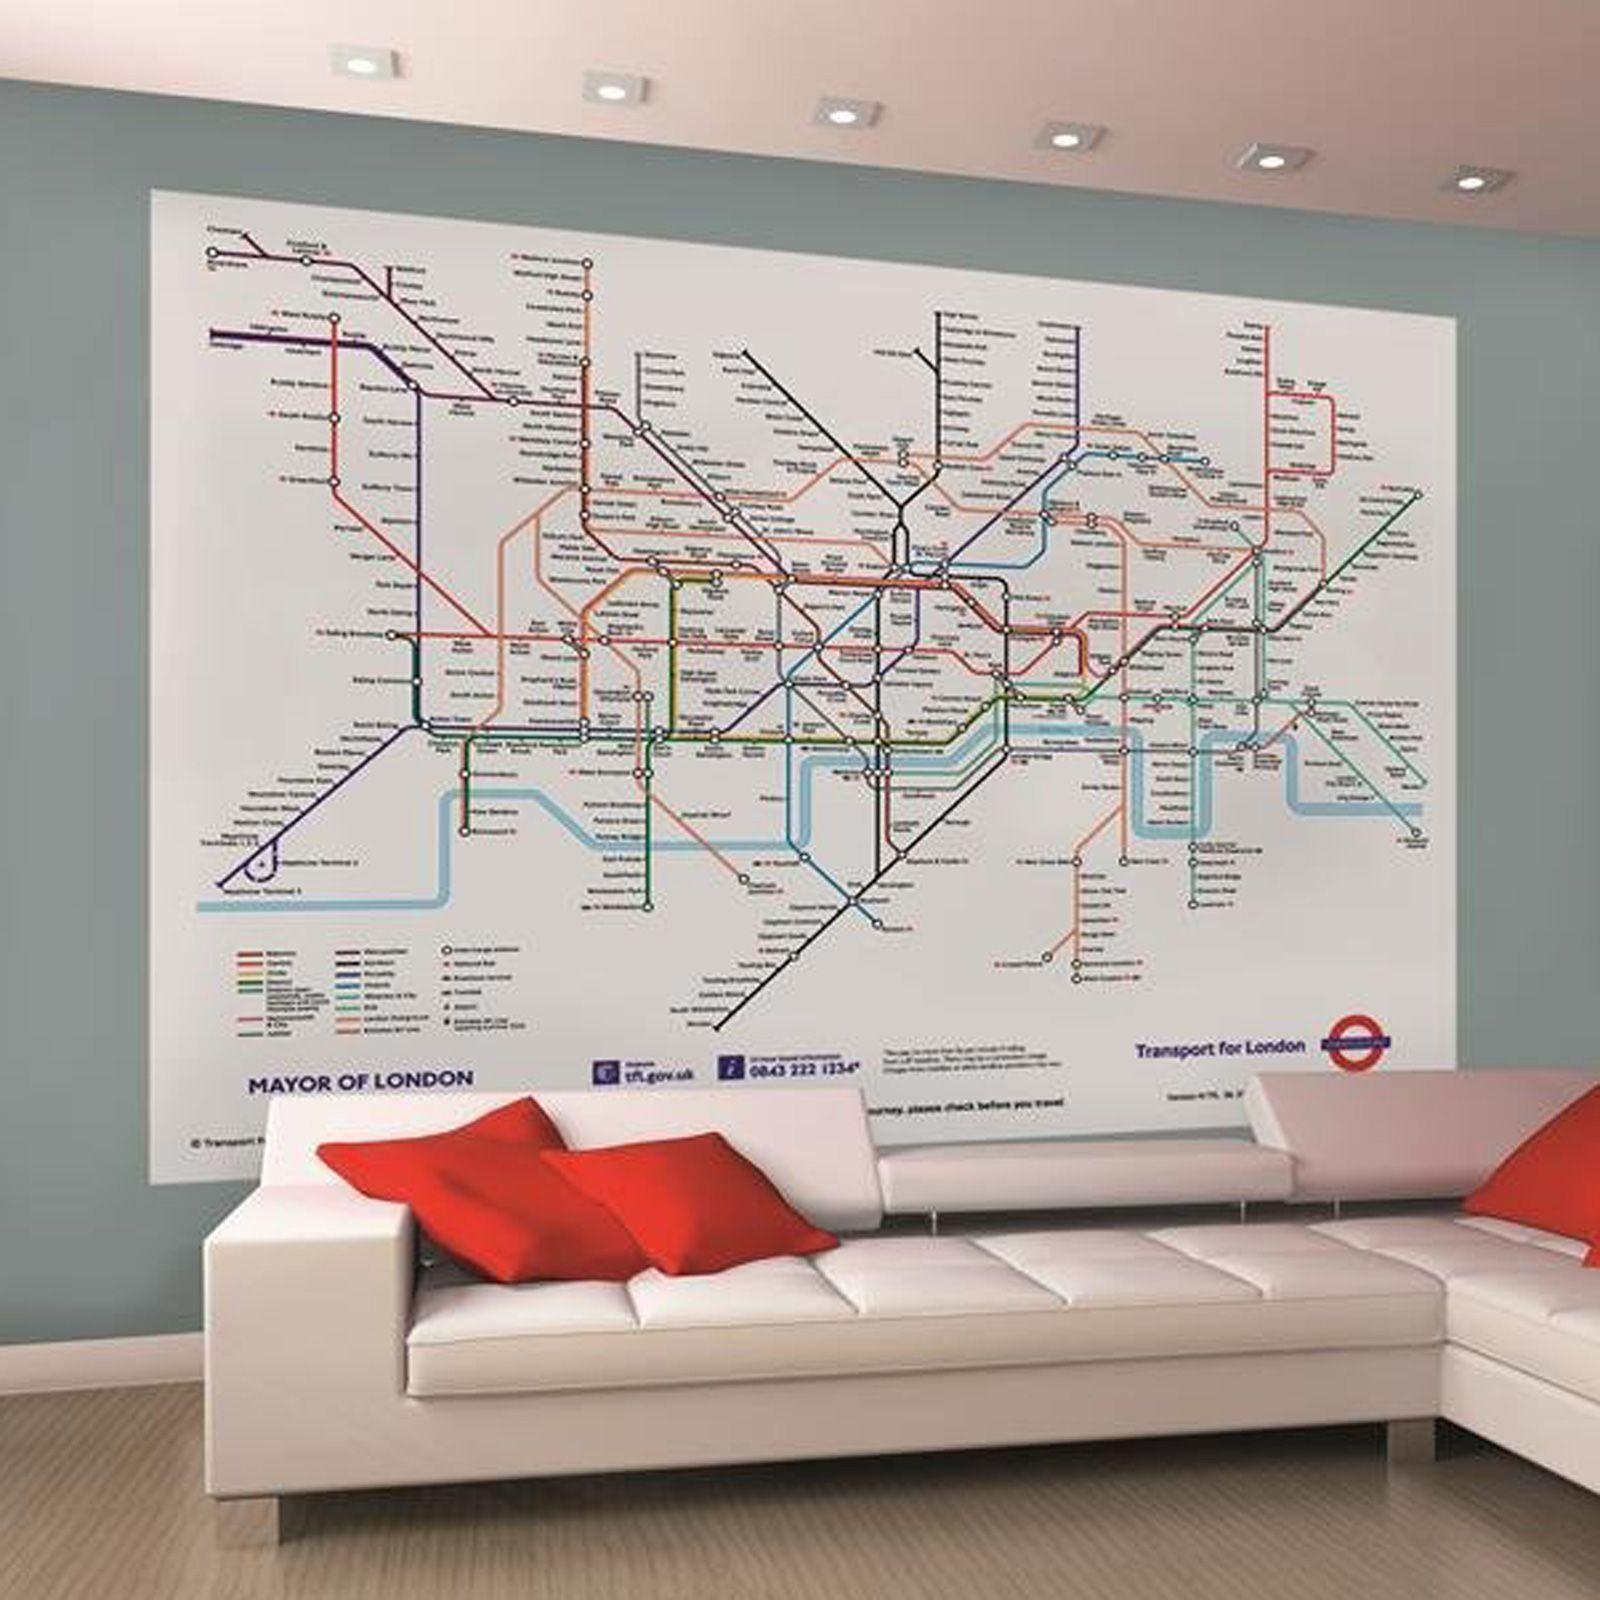 Subway Map Wall Art Wall Art Stickers Wall Decal Huge Underground Tube Map.41 London Underground Wallpaper On Wallpapersafari